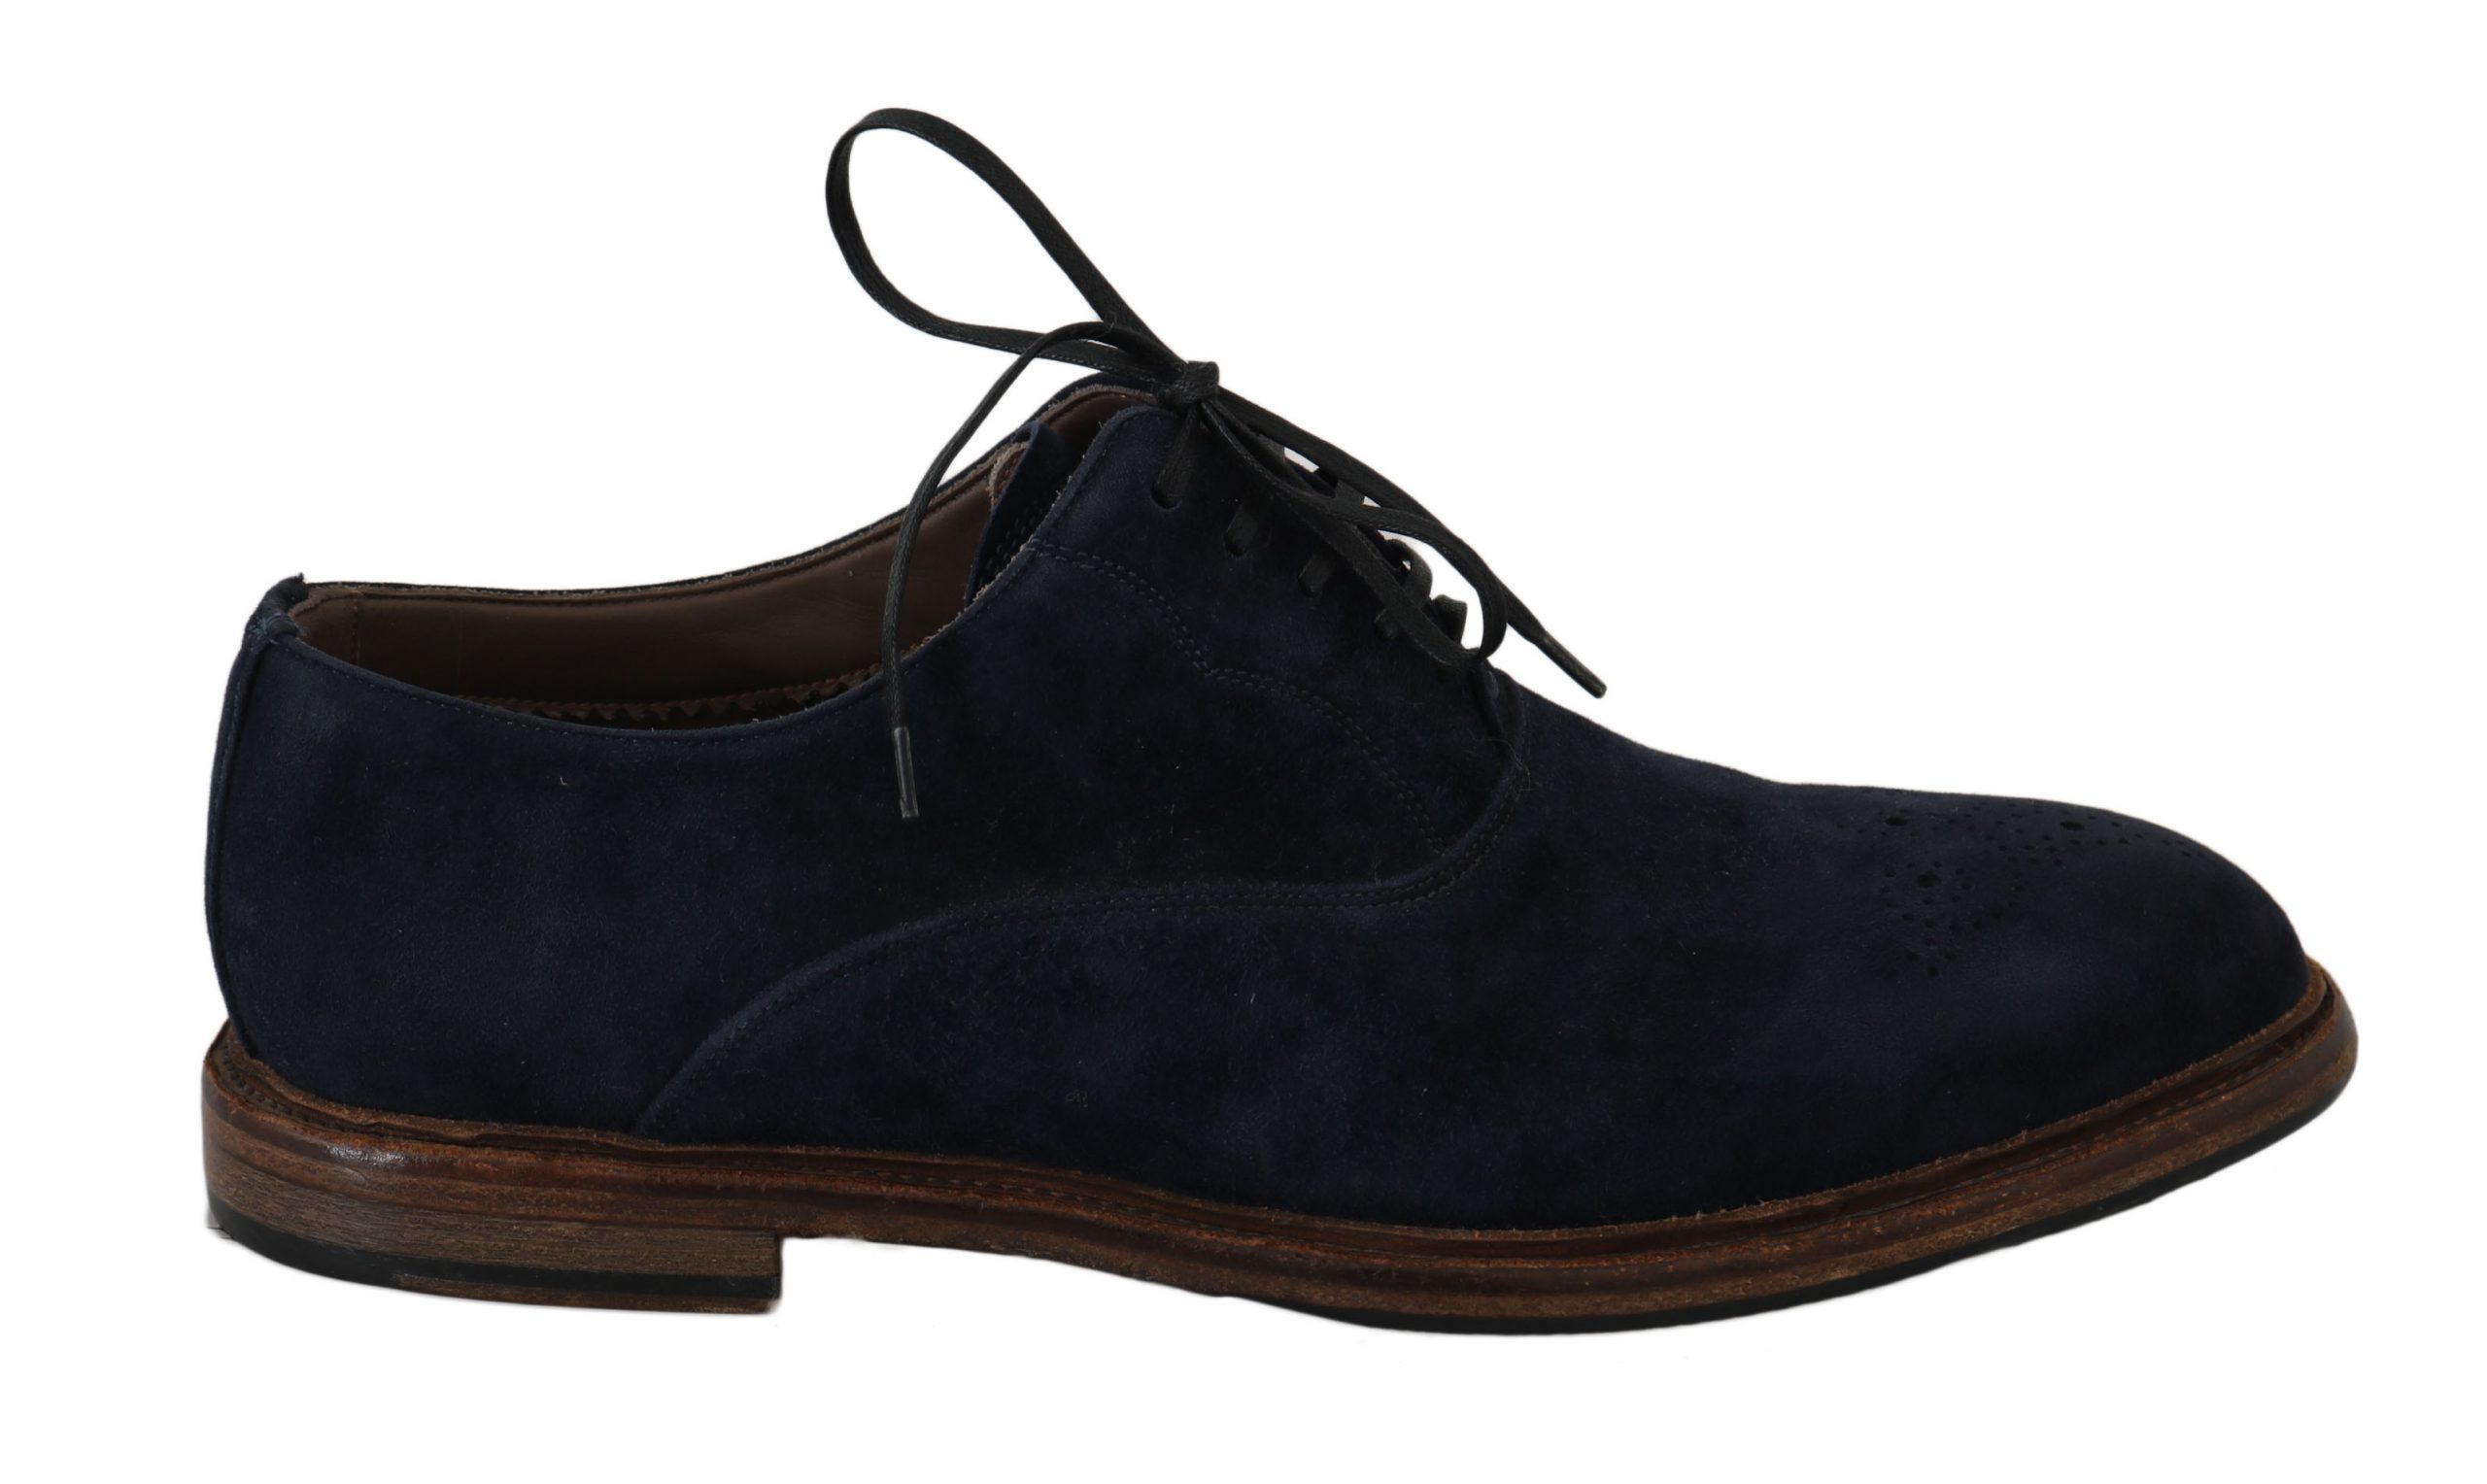 Dolce & Gabbana Men's Shoes Blue MV2333 - EU39/US6